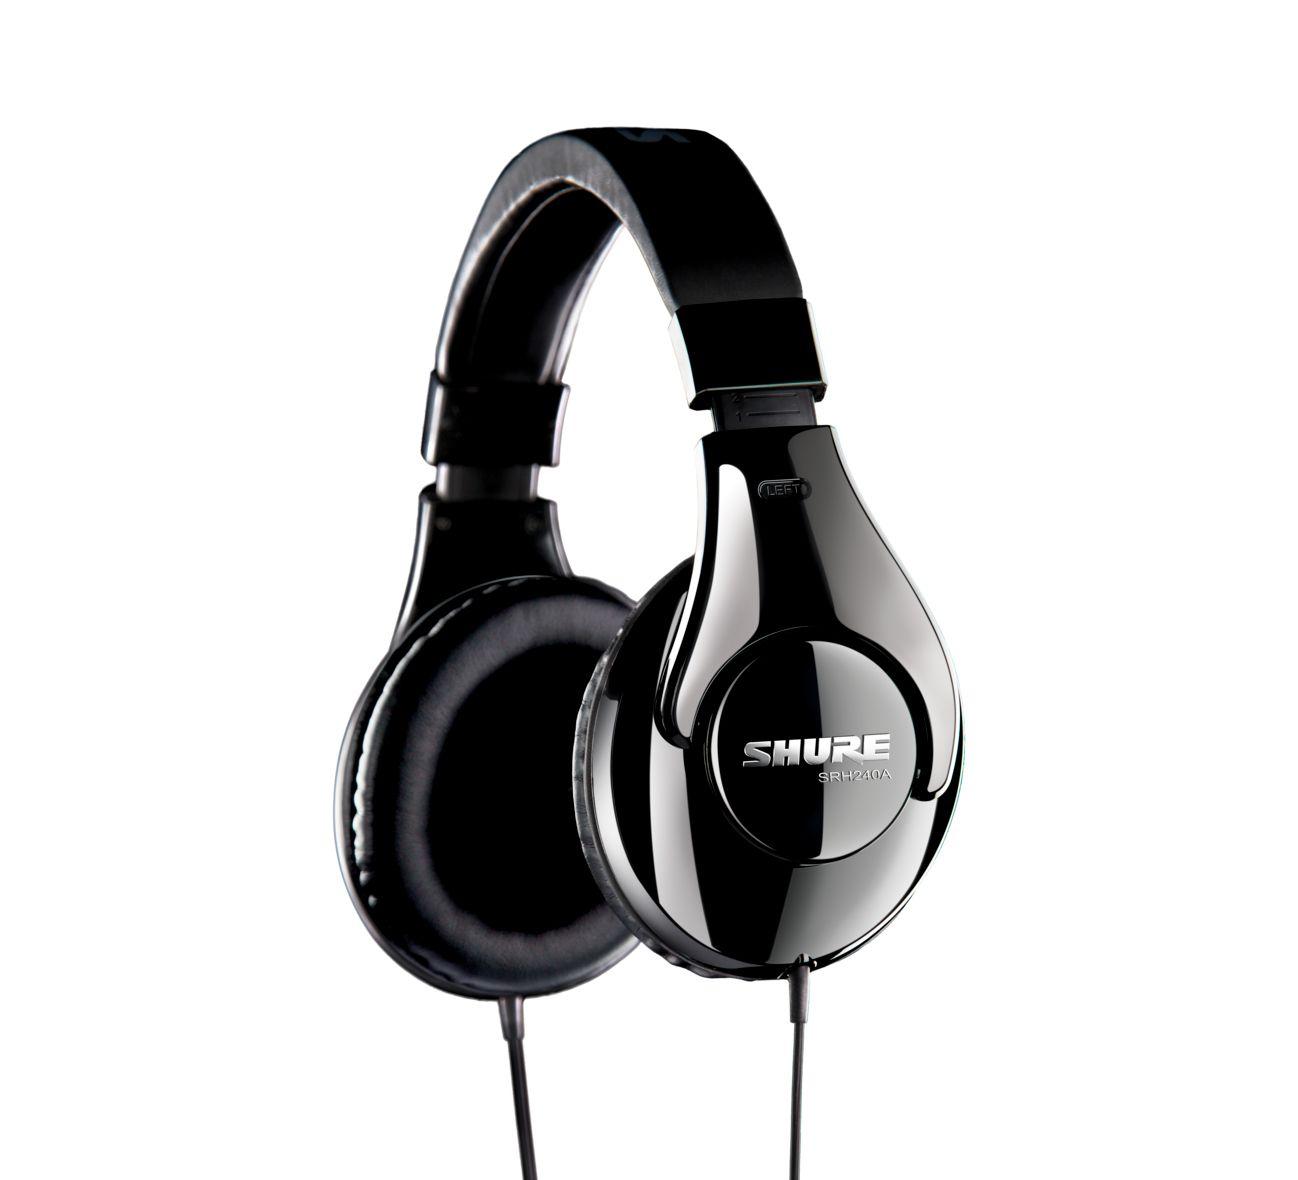 Fone de Ouvido Headphone Pro SRH240A Shure